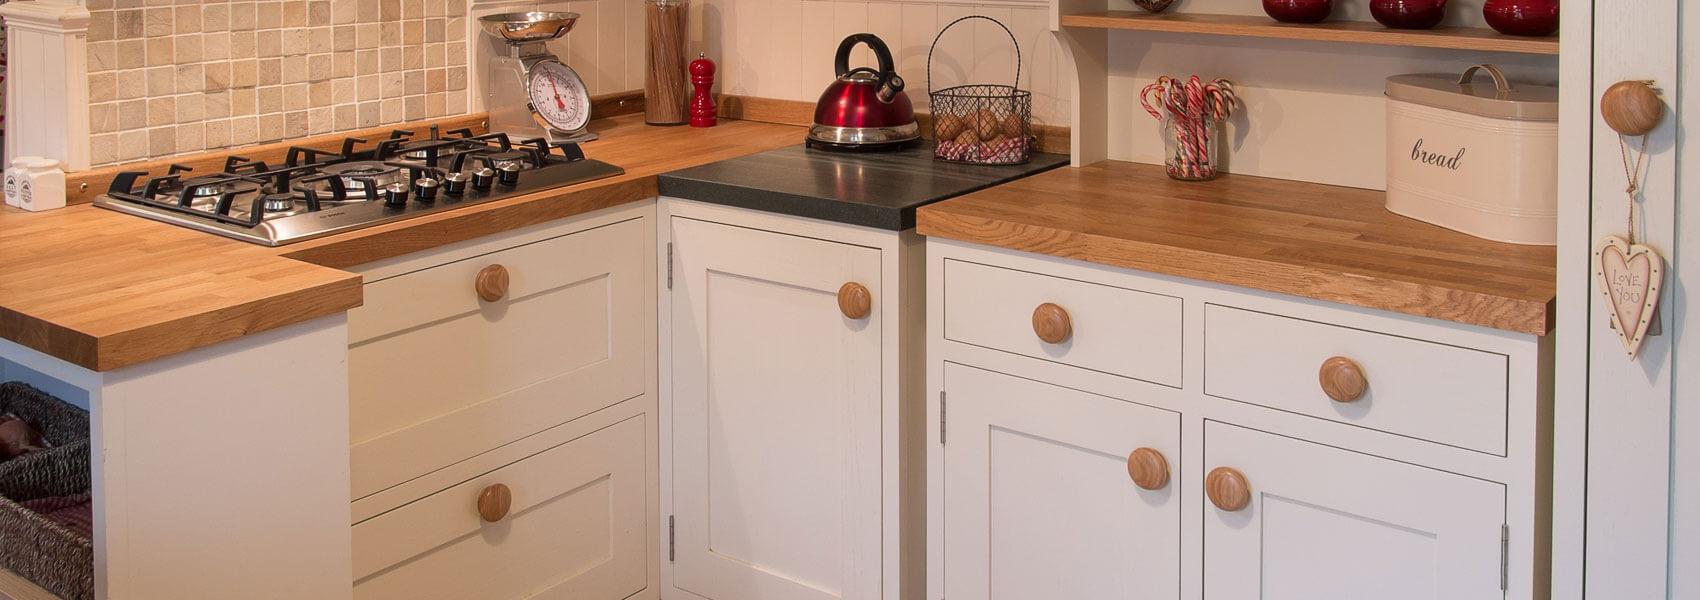 Lonsdale Solid Oak Freestanding Kitchen | Hayton & Higgins